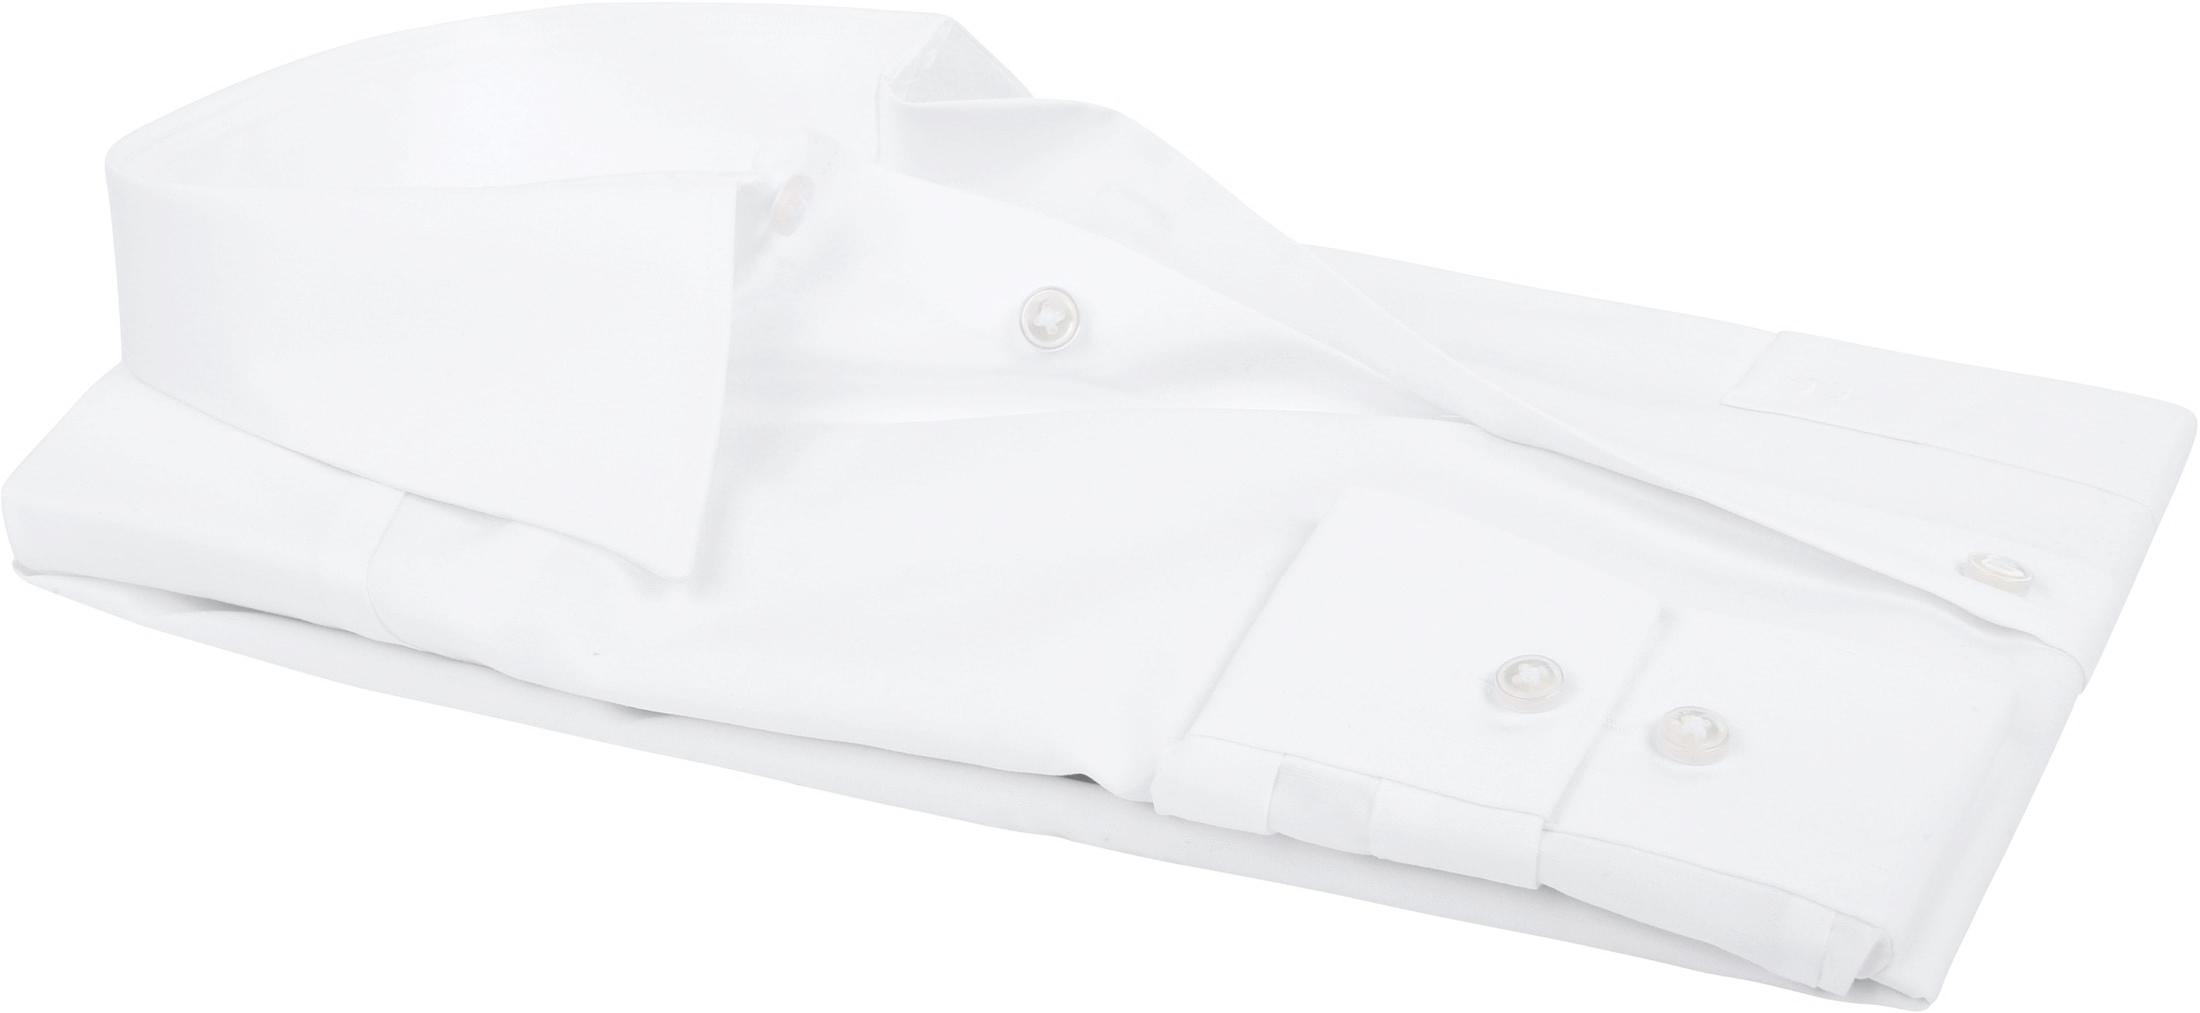 OLYMP Luxor Comfort Fit Overhemd Wit foto 3